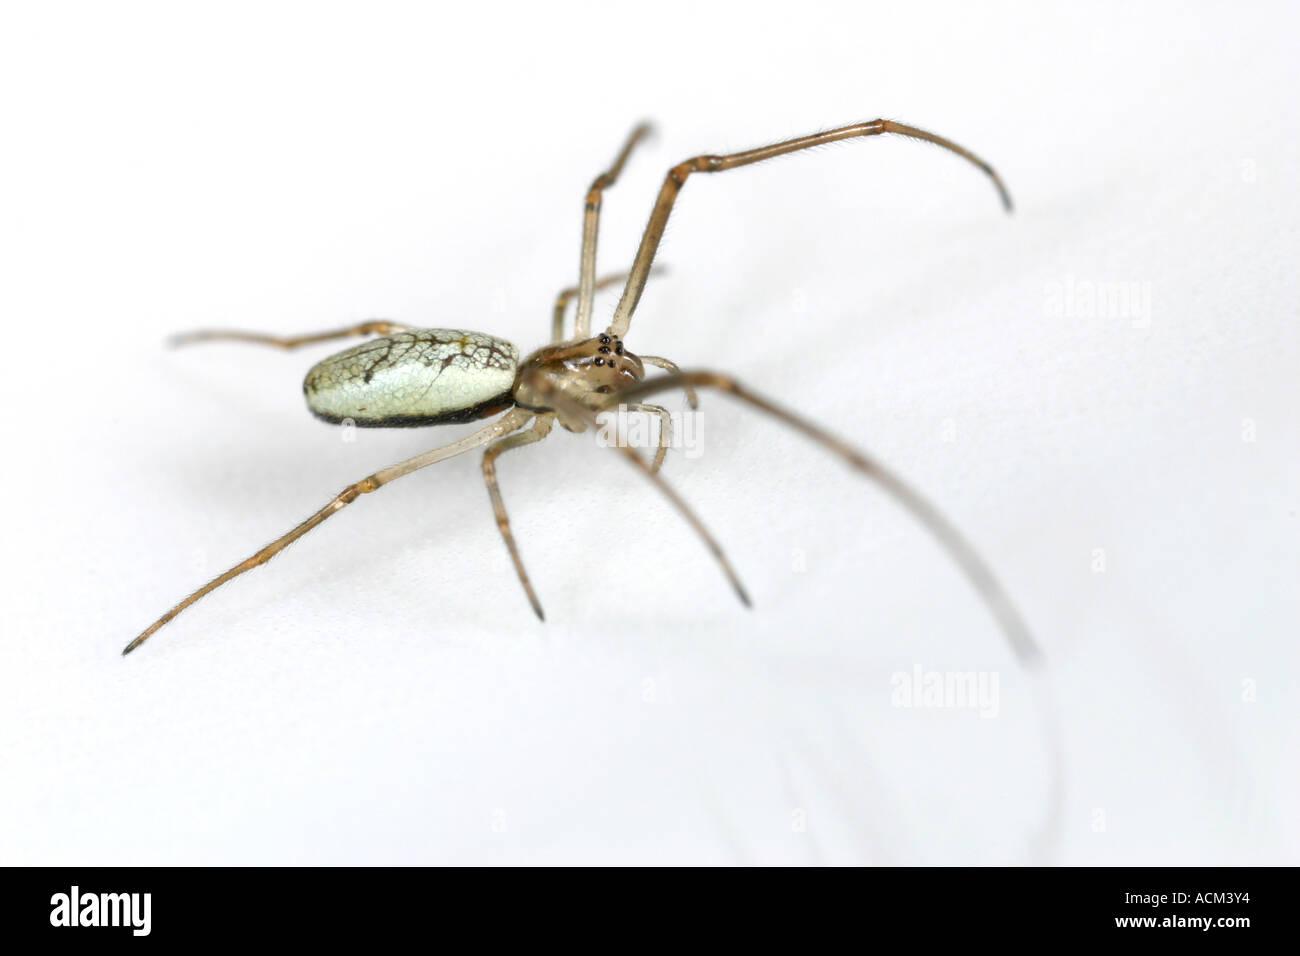 Small green stretch spider, Tetragnatha pinicola, on white background. - Stock Image